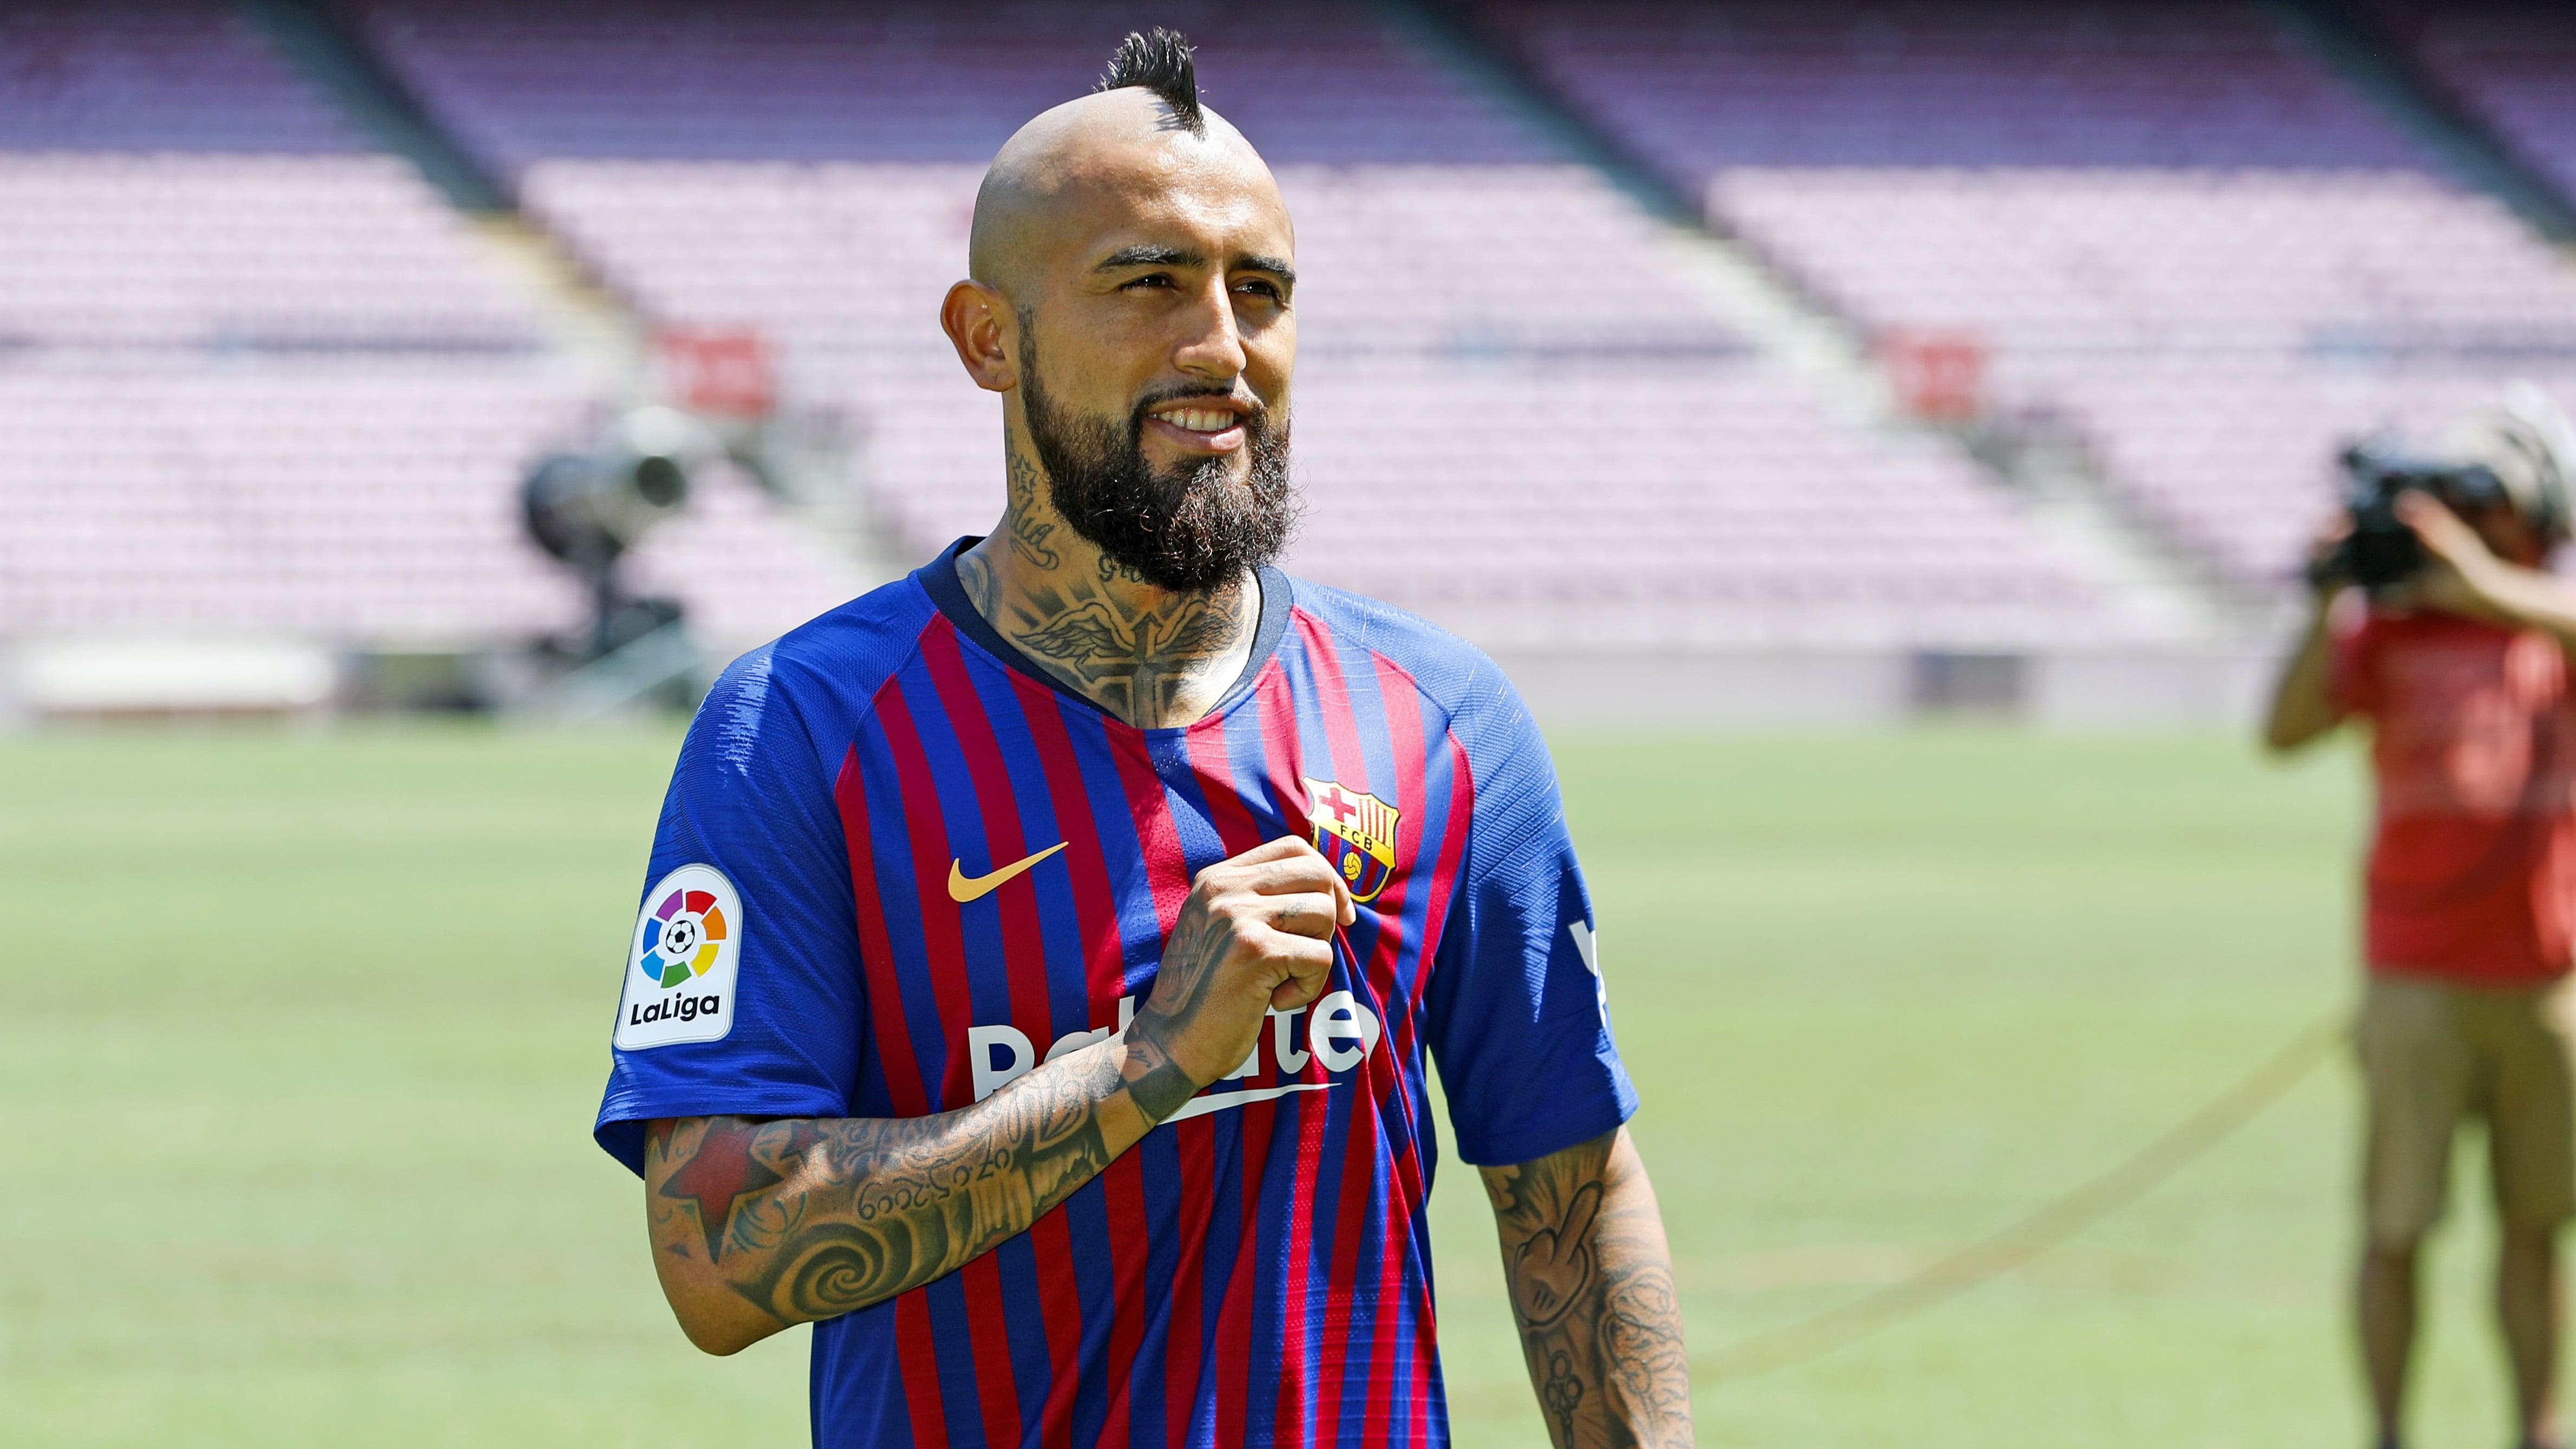 Arturo Vidal's first 24 hours in Barcelona